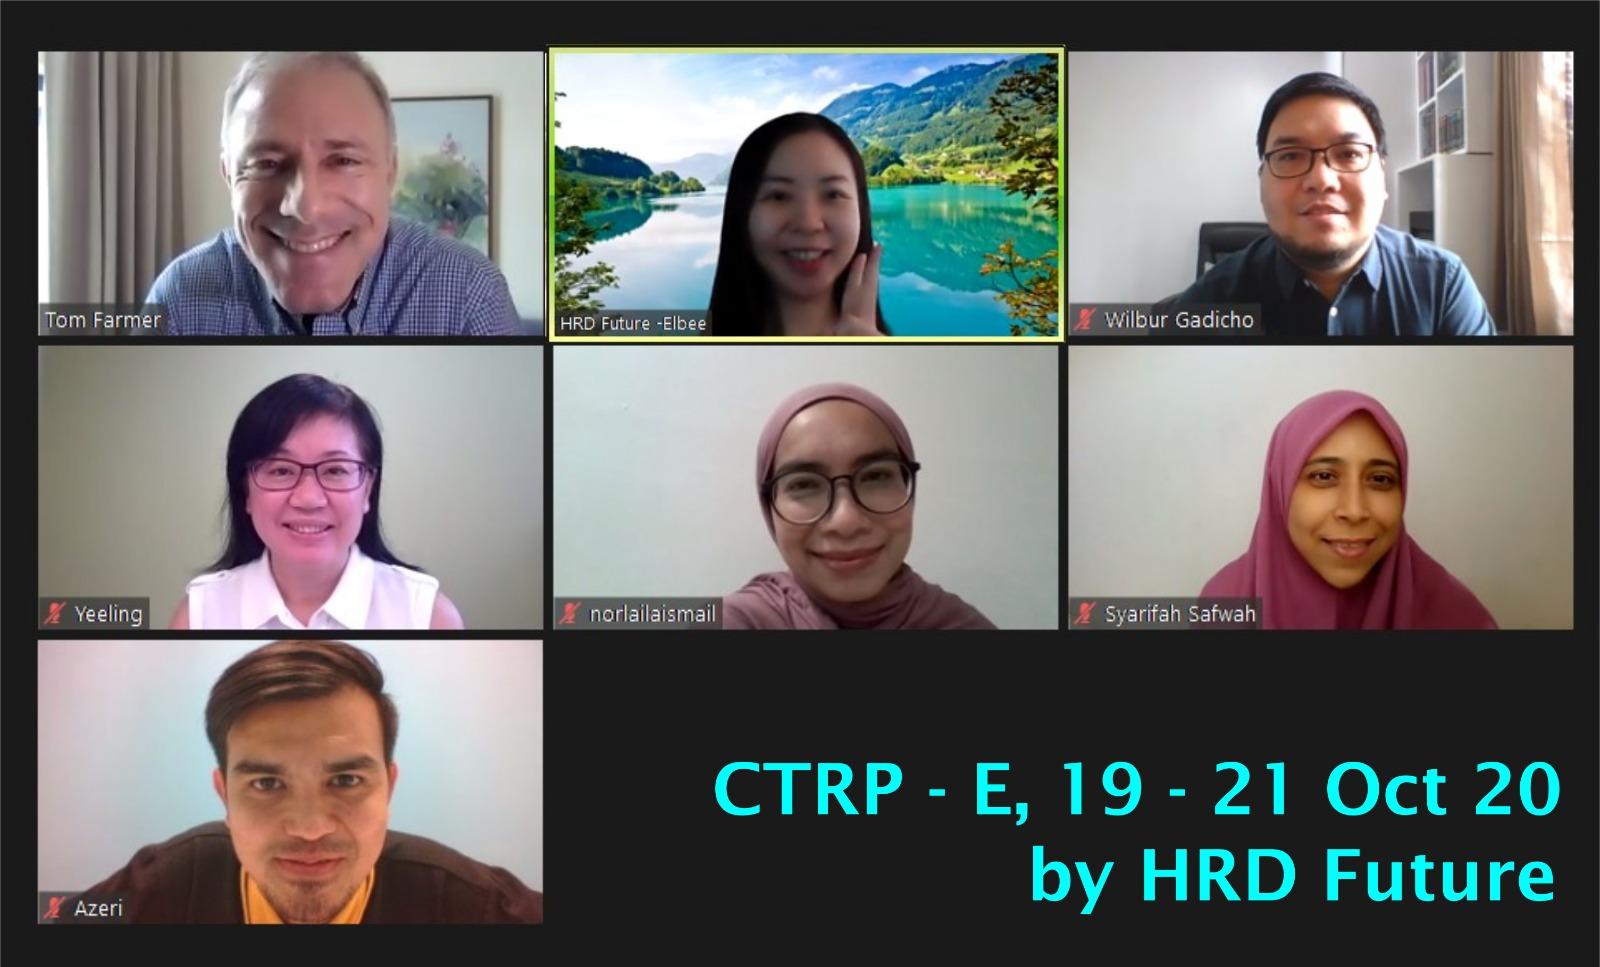 Group Photo CTRP (HRD) 2020 10 21